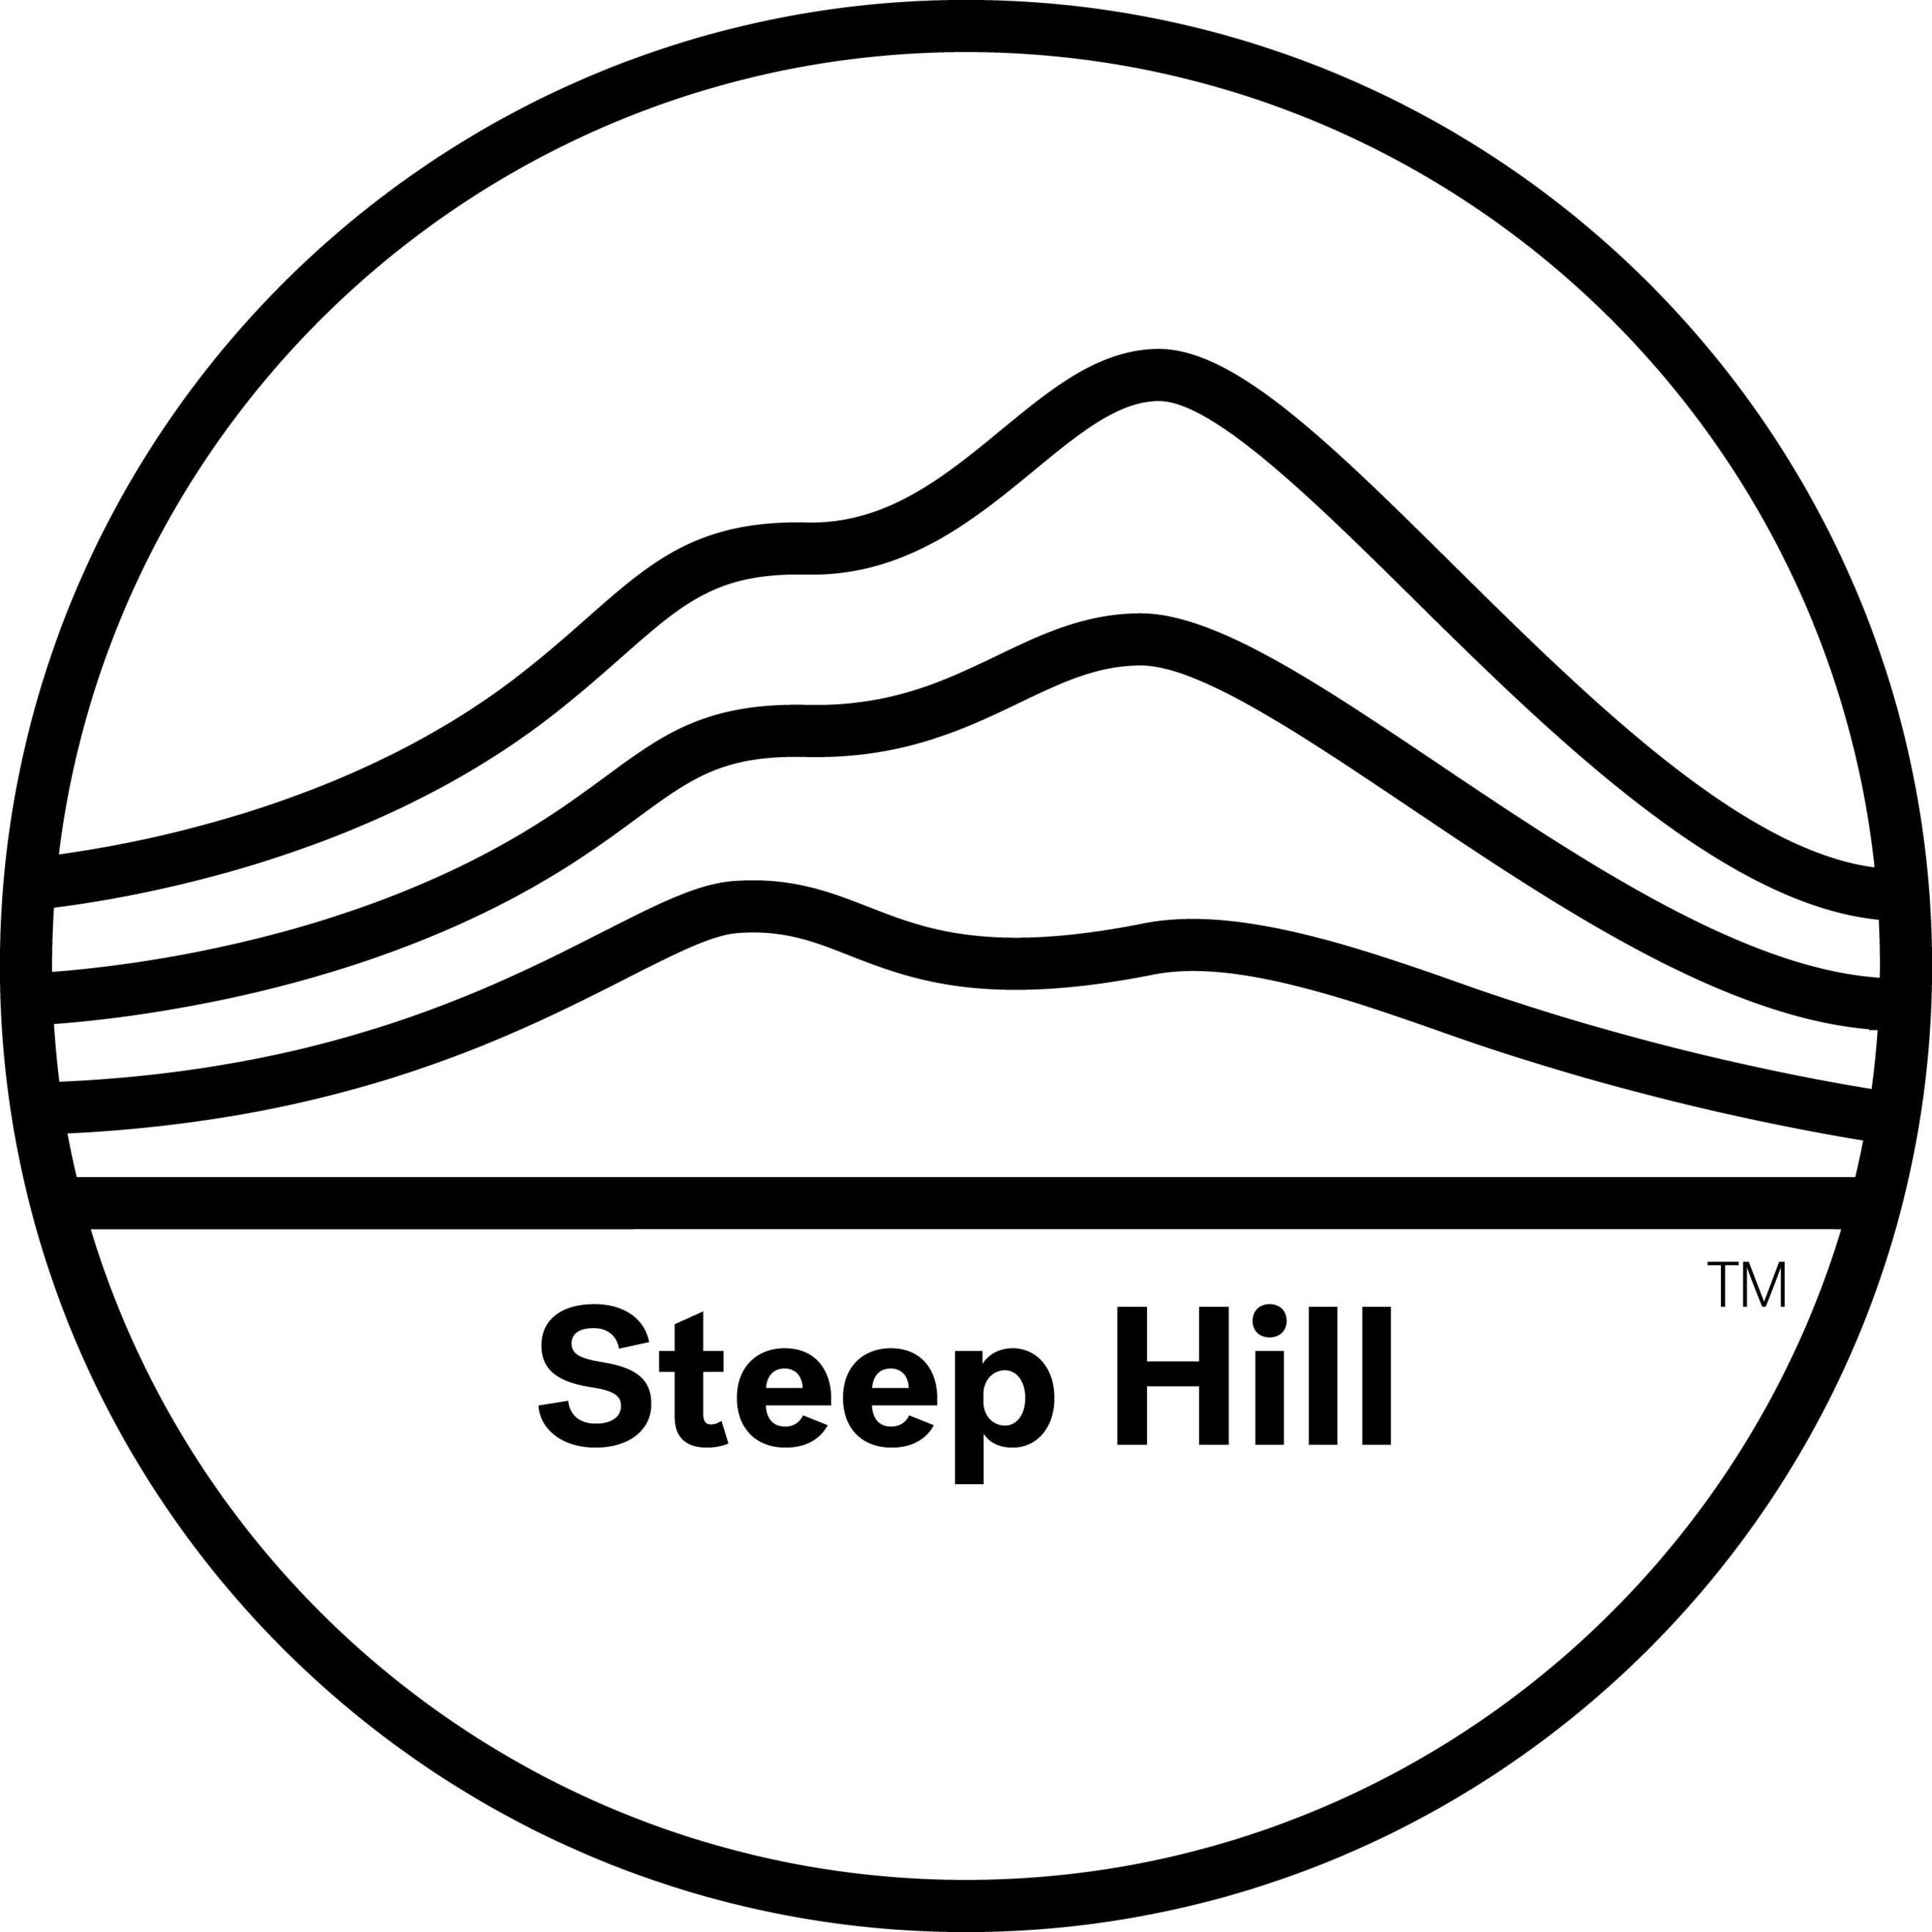 Steep Hill logo